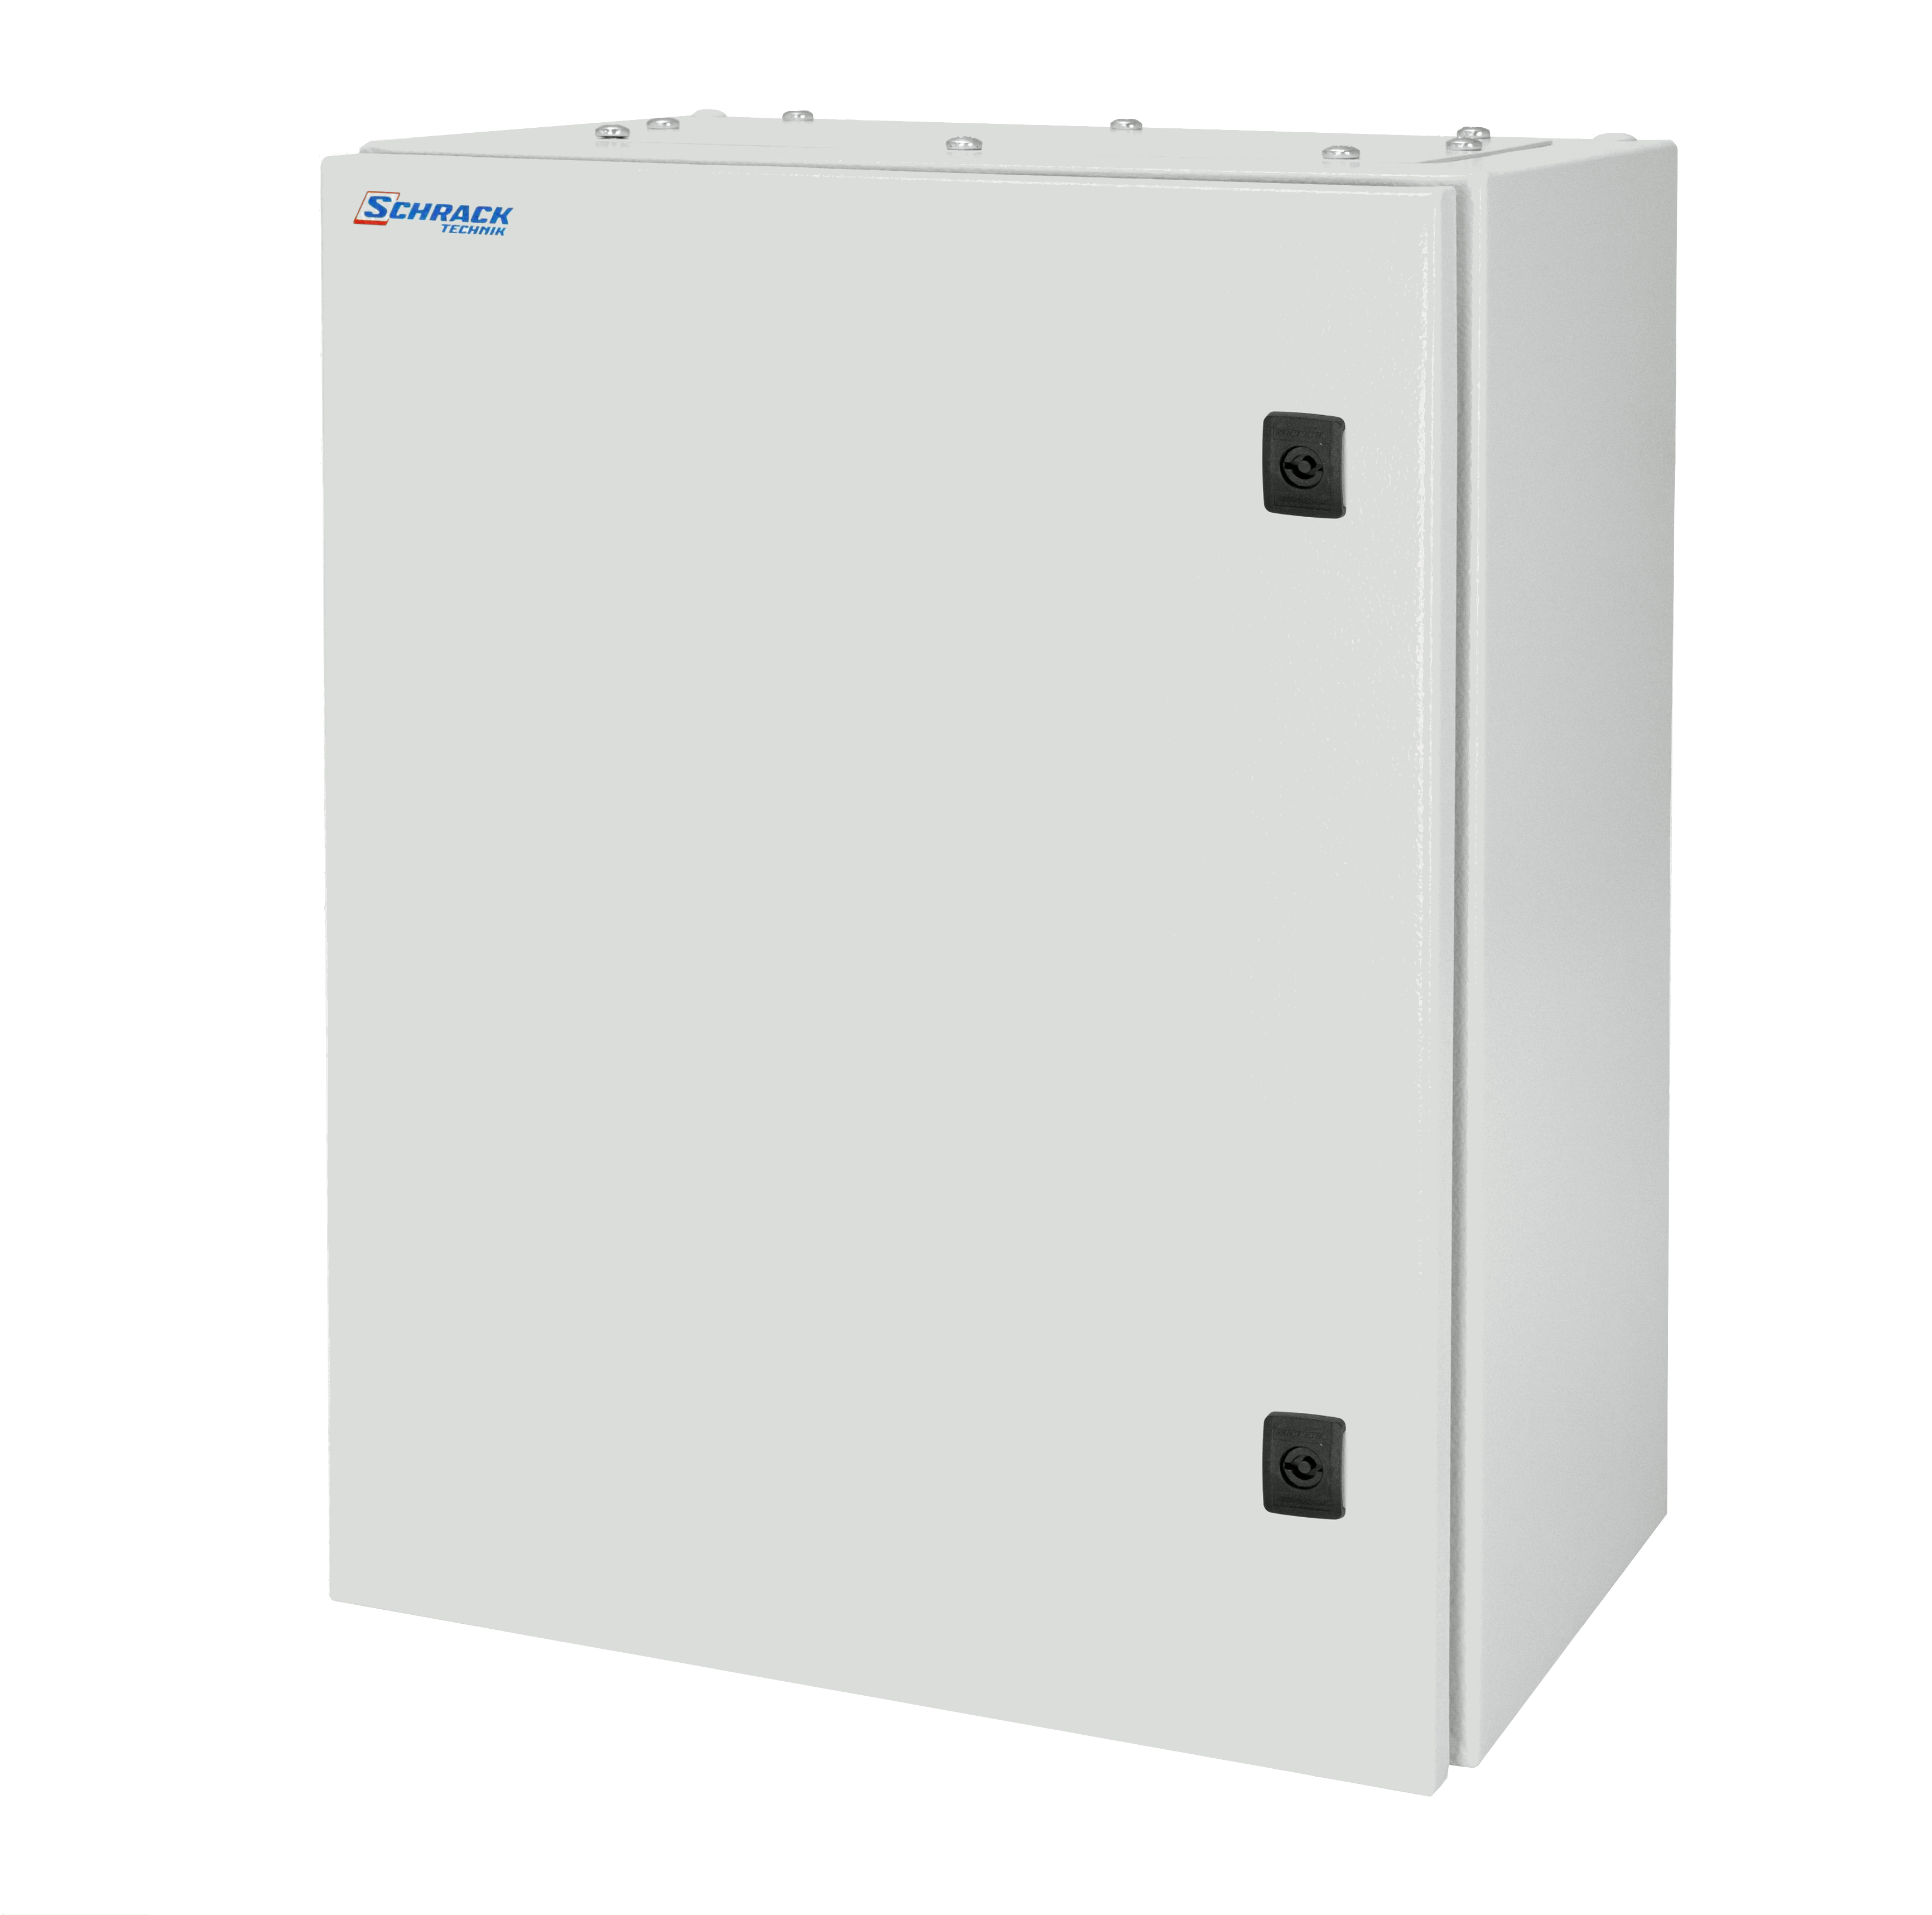 1 Stk Wandschrank Mono IP66 H=600 B=600 T=400 Stahlblech WSM6060400